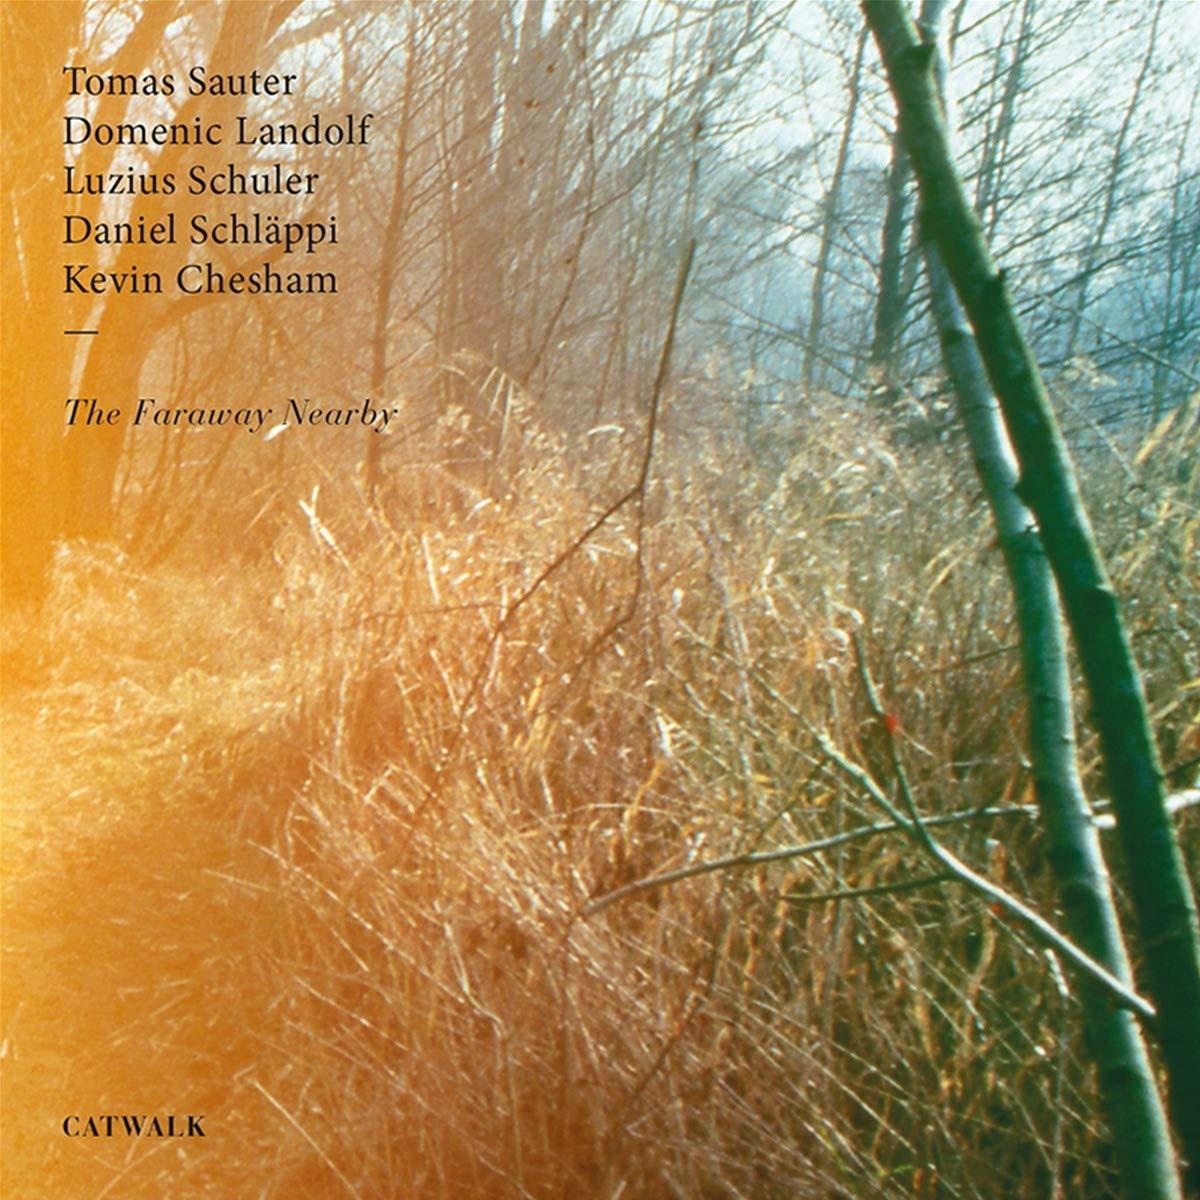 CD : TOMAS SAUTER - DOMENIC LANDOLF - LUZIUS SCHULER - Faraway Nearby (United Kingdom - Import)